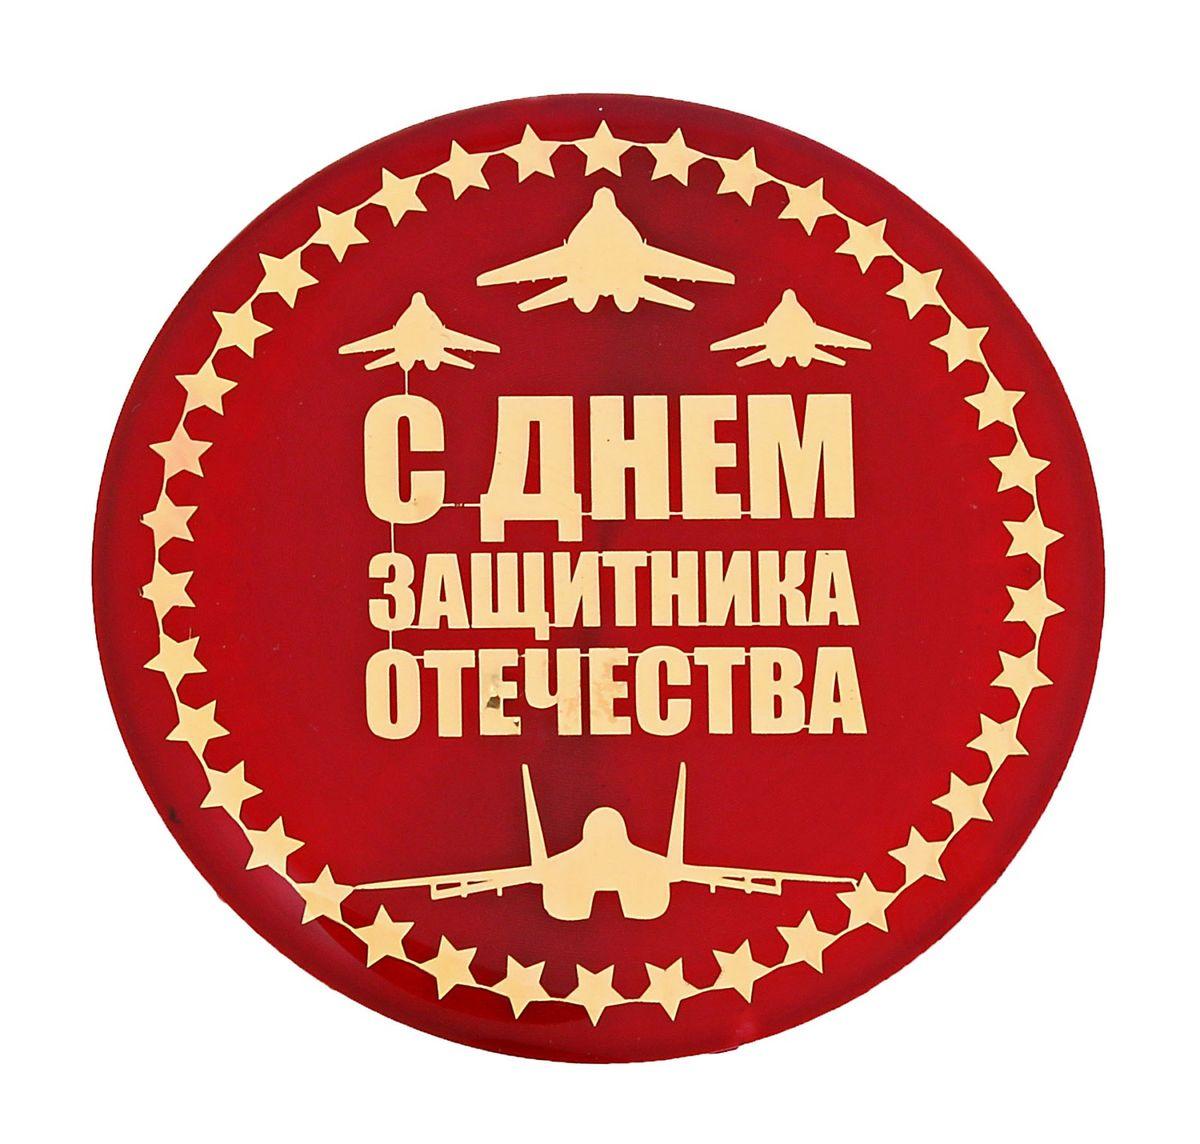 Декоративный магнит Sima-land С Днем защитника Отечества, диаметр 5 см. 592014